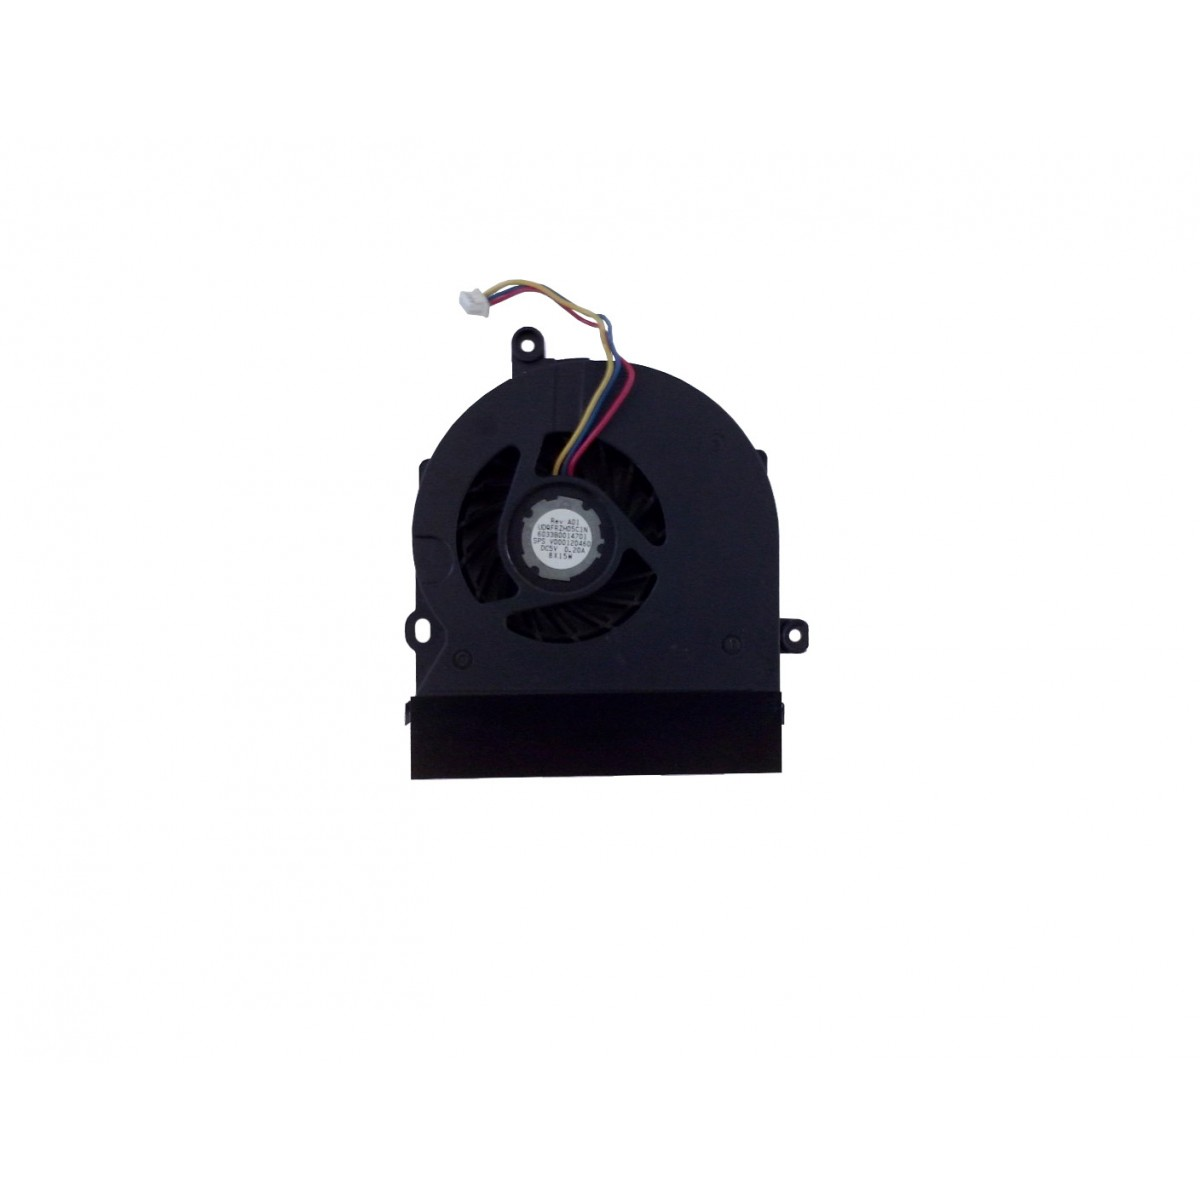 Cooler P/ Notebook Toshiba PSLC8U UDQFRZH05C1N